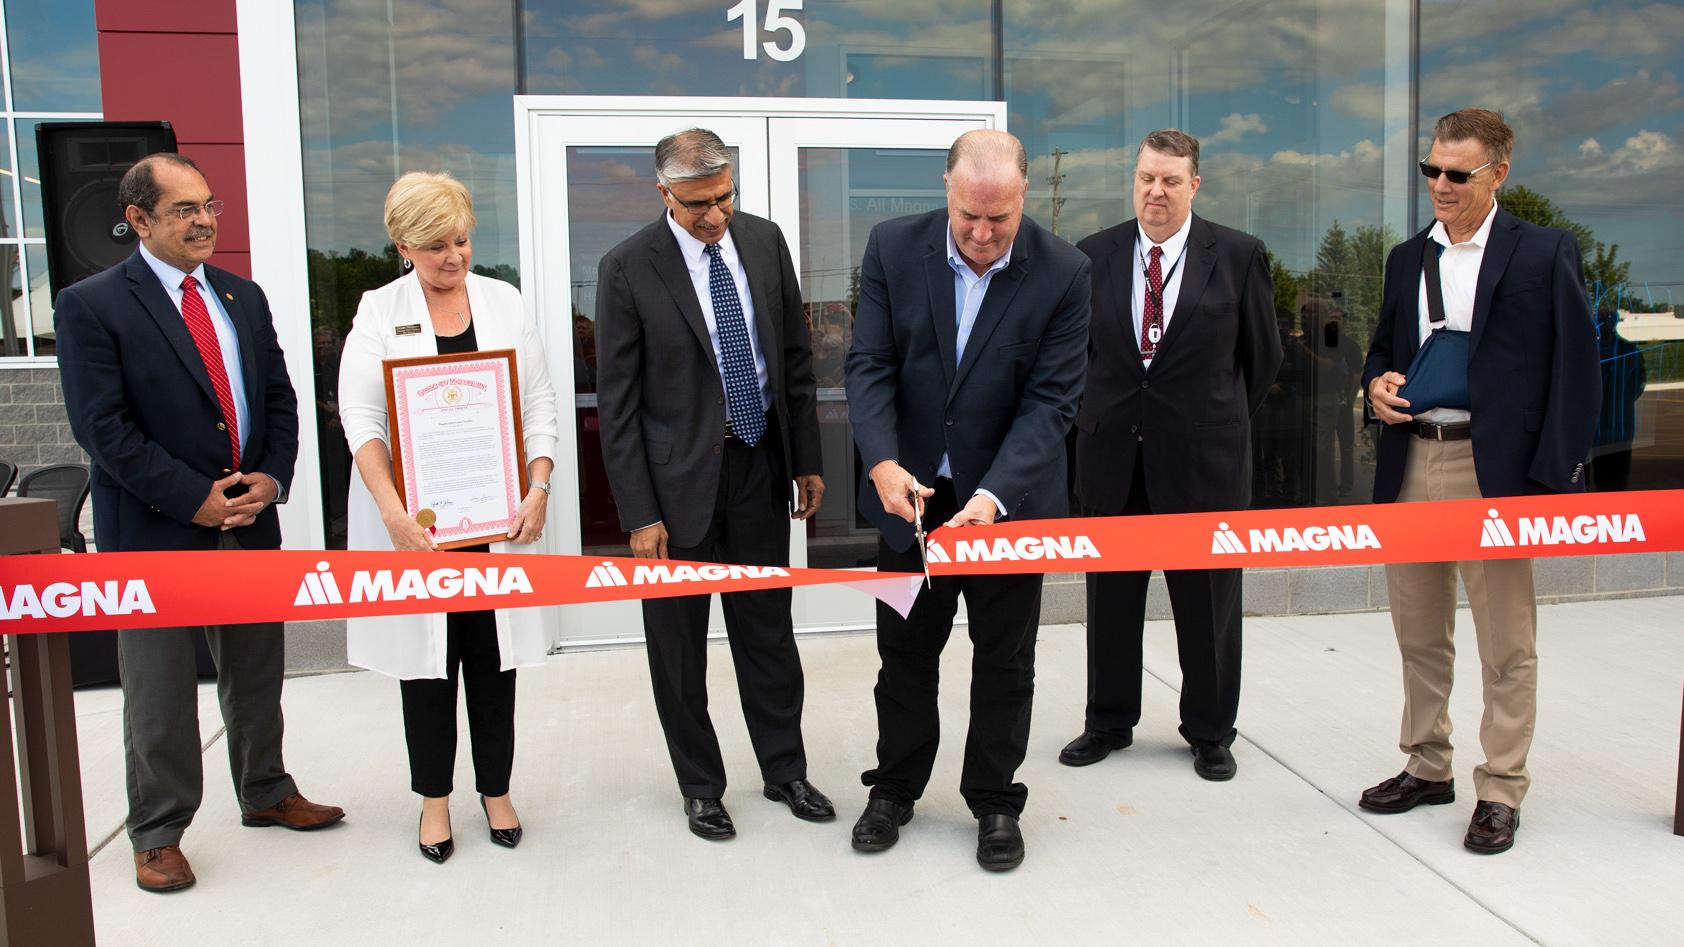 Magna Ribbon Cutting, Grand Blanc, MI